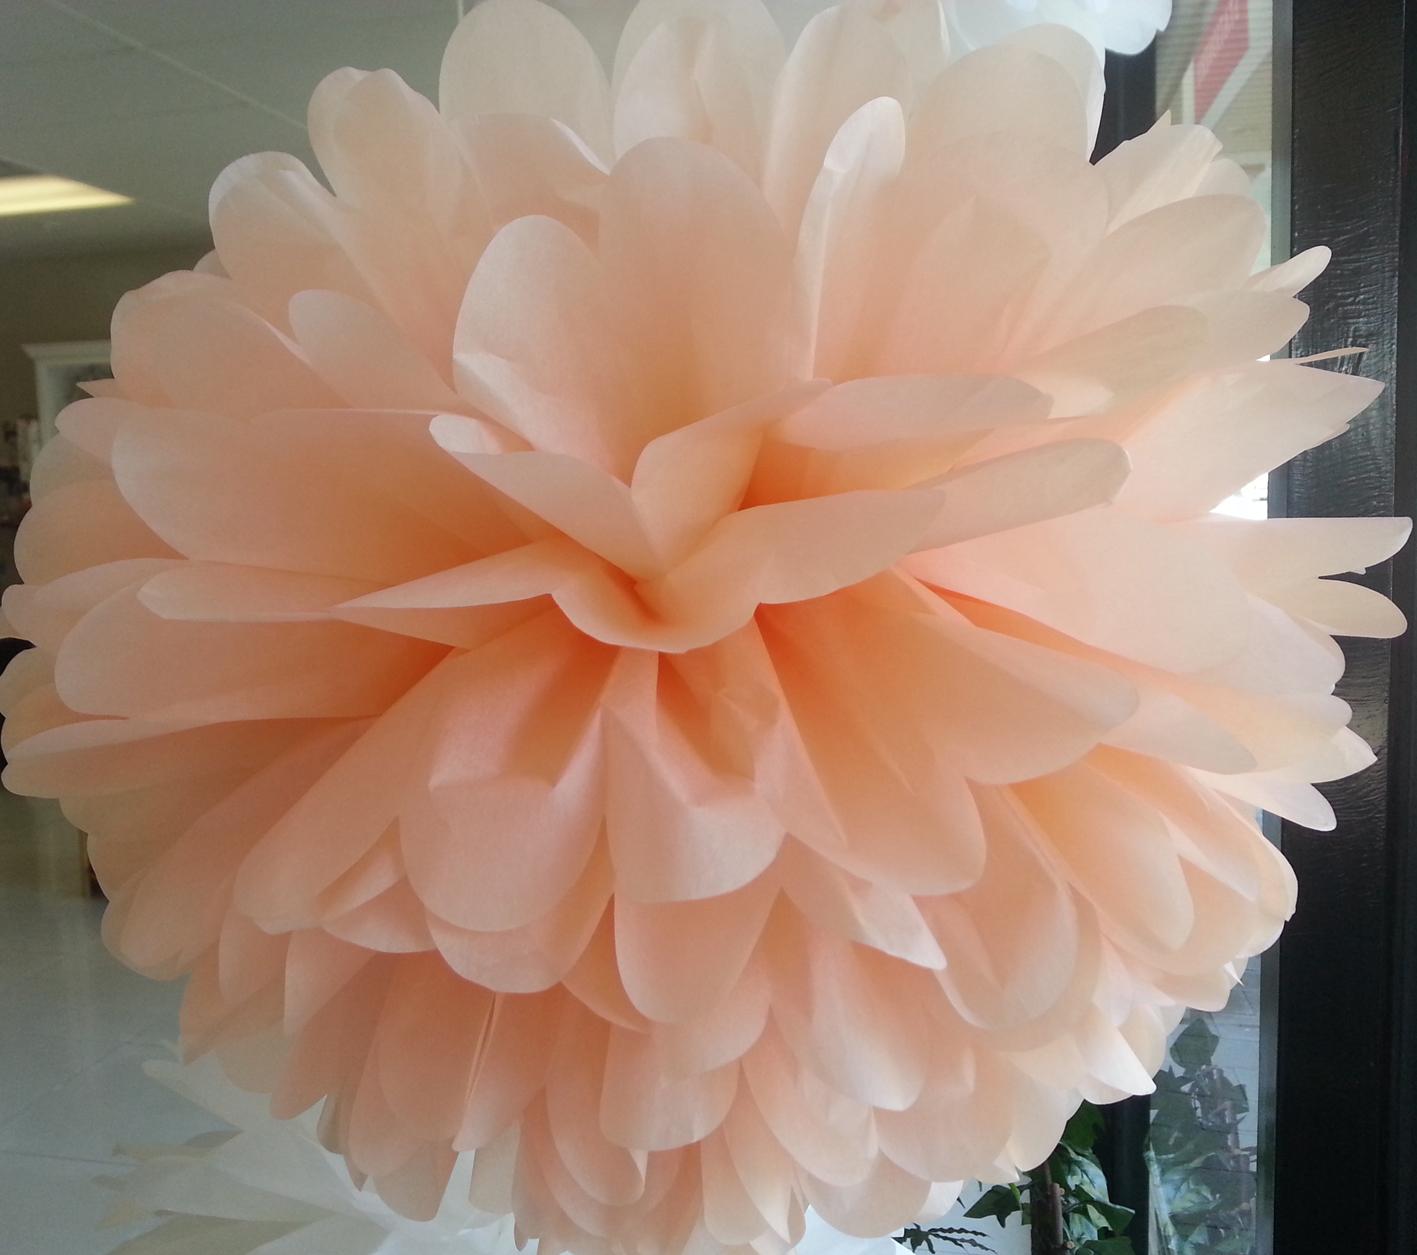 Peach+Tissue+Pom+Pom+Sydney.jpg